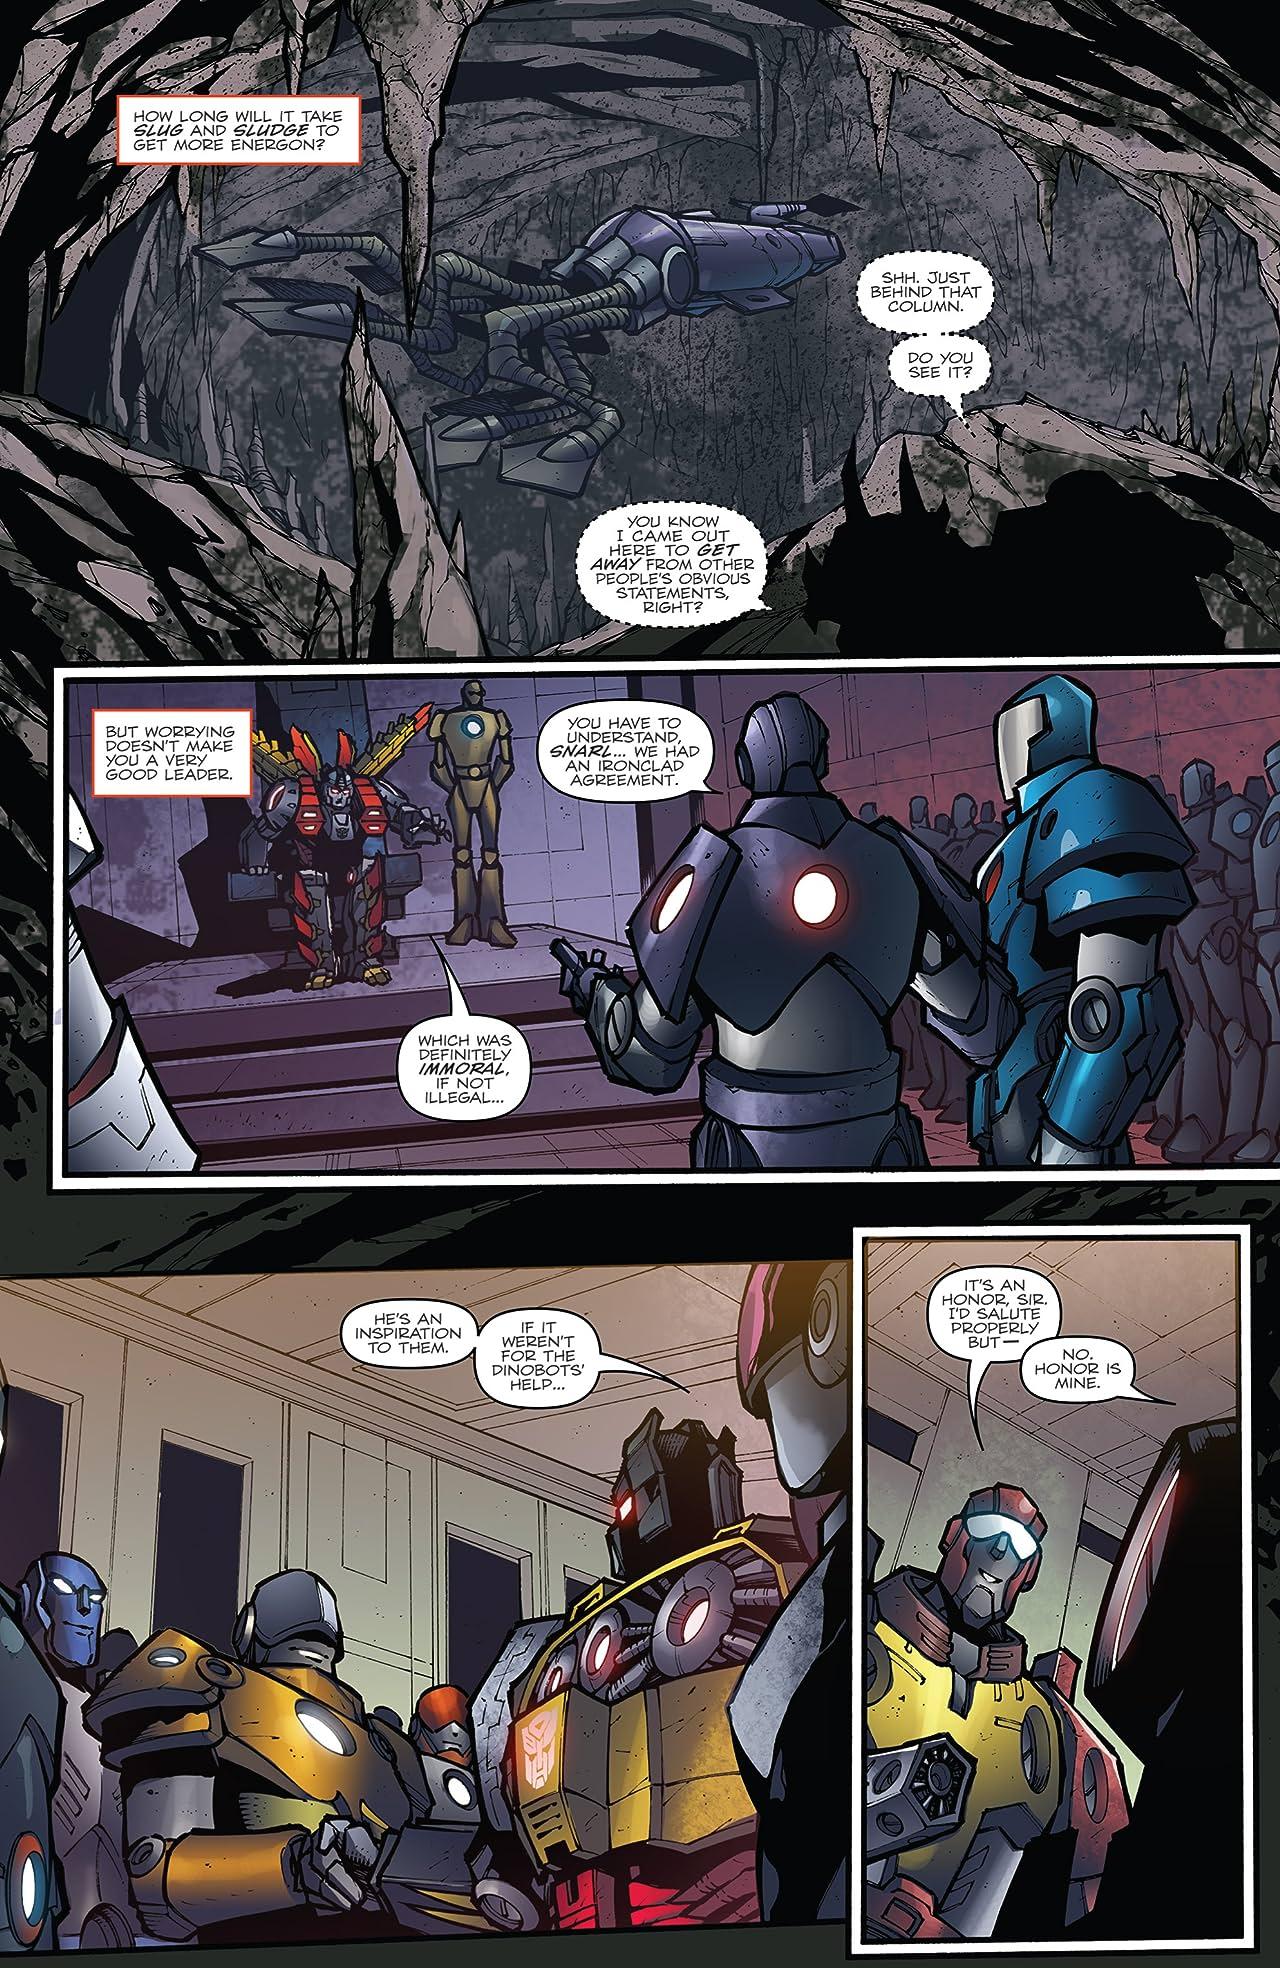 Transformers: Prime - Beast Hunters Vol. 2